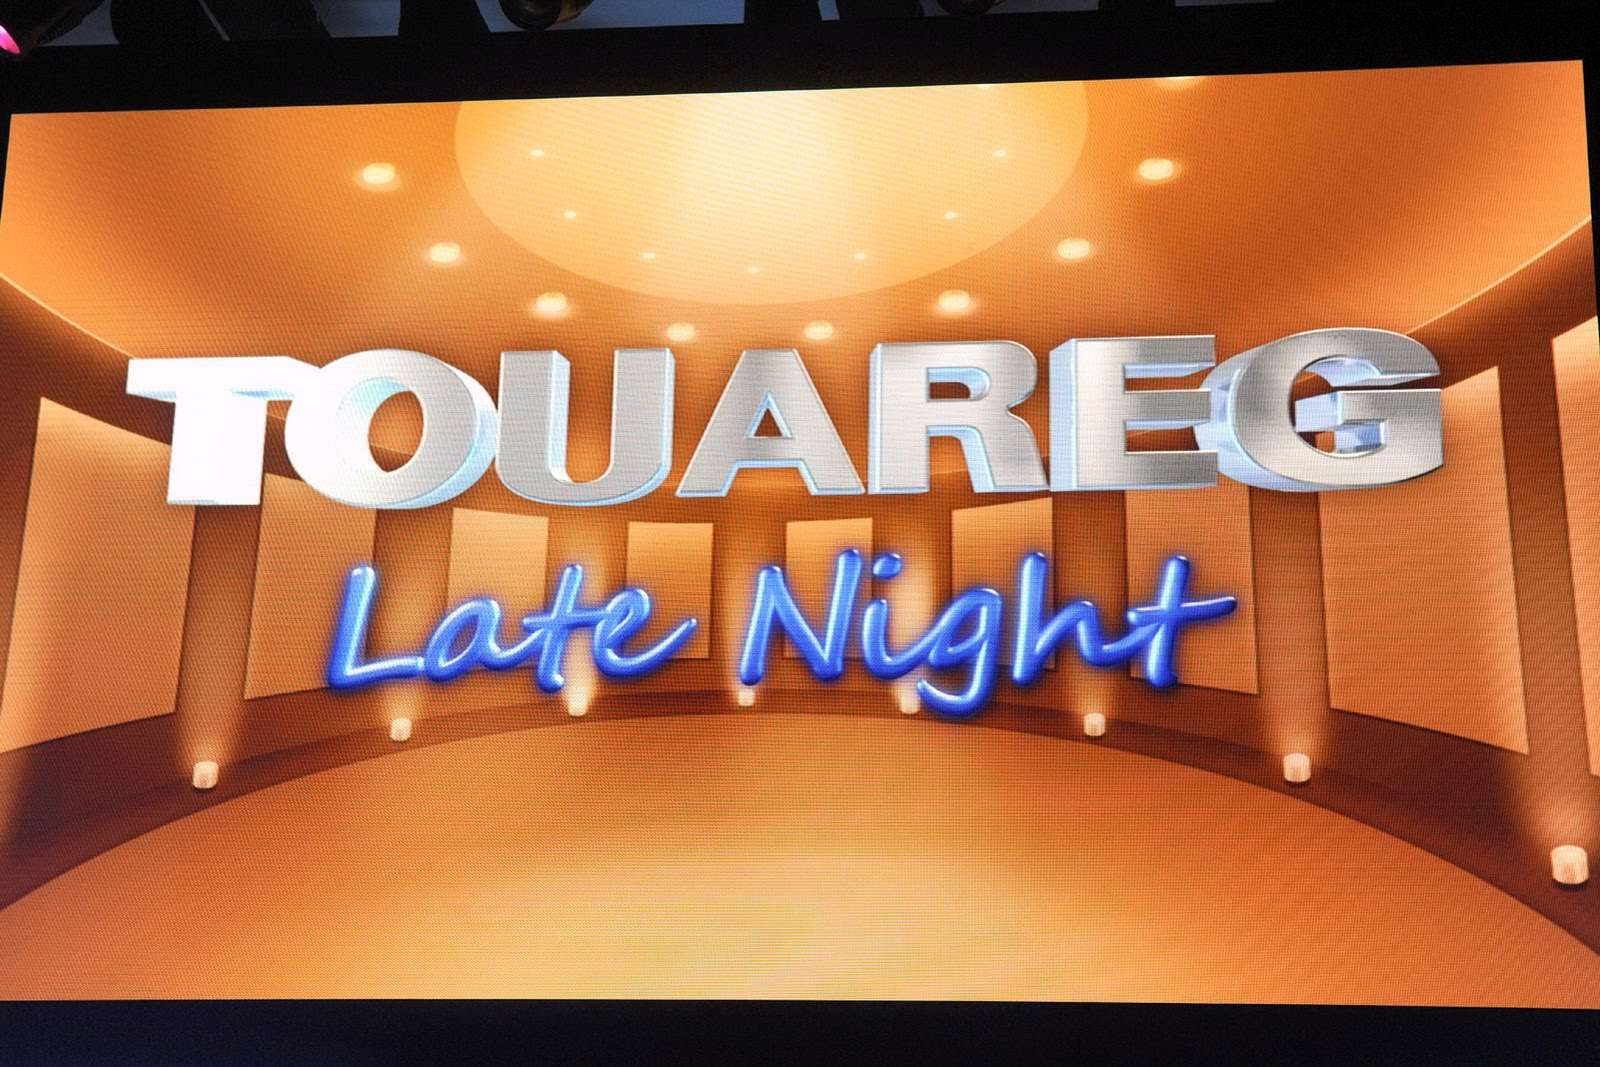 VW Touareg 2011 Late Night Show 2010